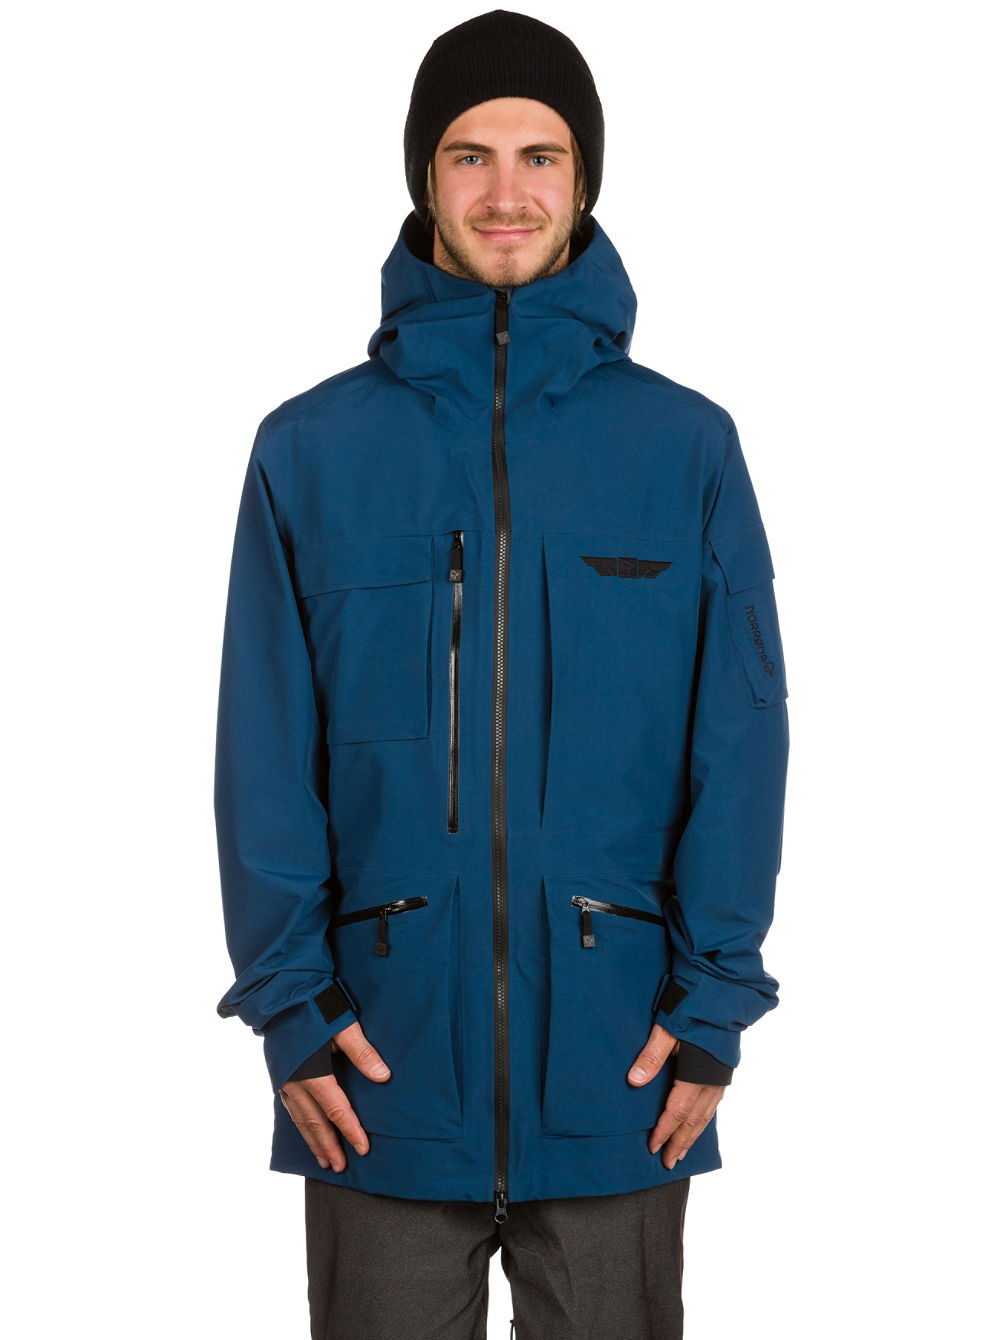 achetez norrona tamok gore tex veste en ligne sur blue. Black Bedroom Furniture Sets. Home Design Ideas